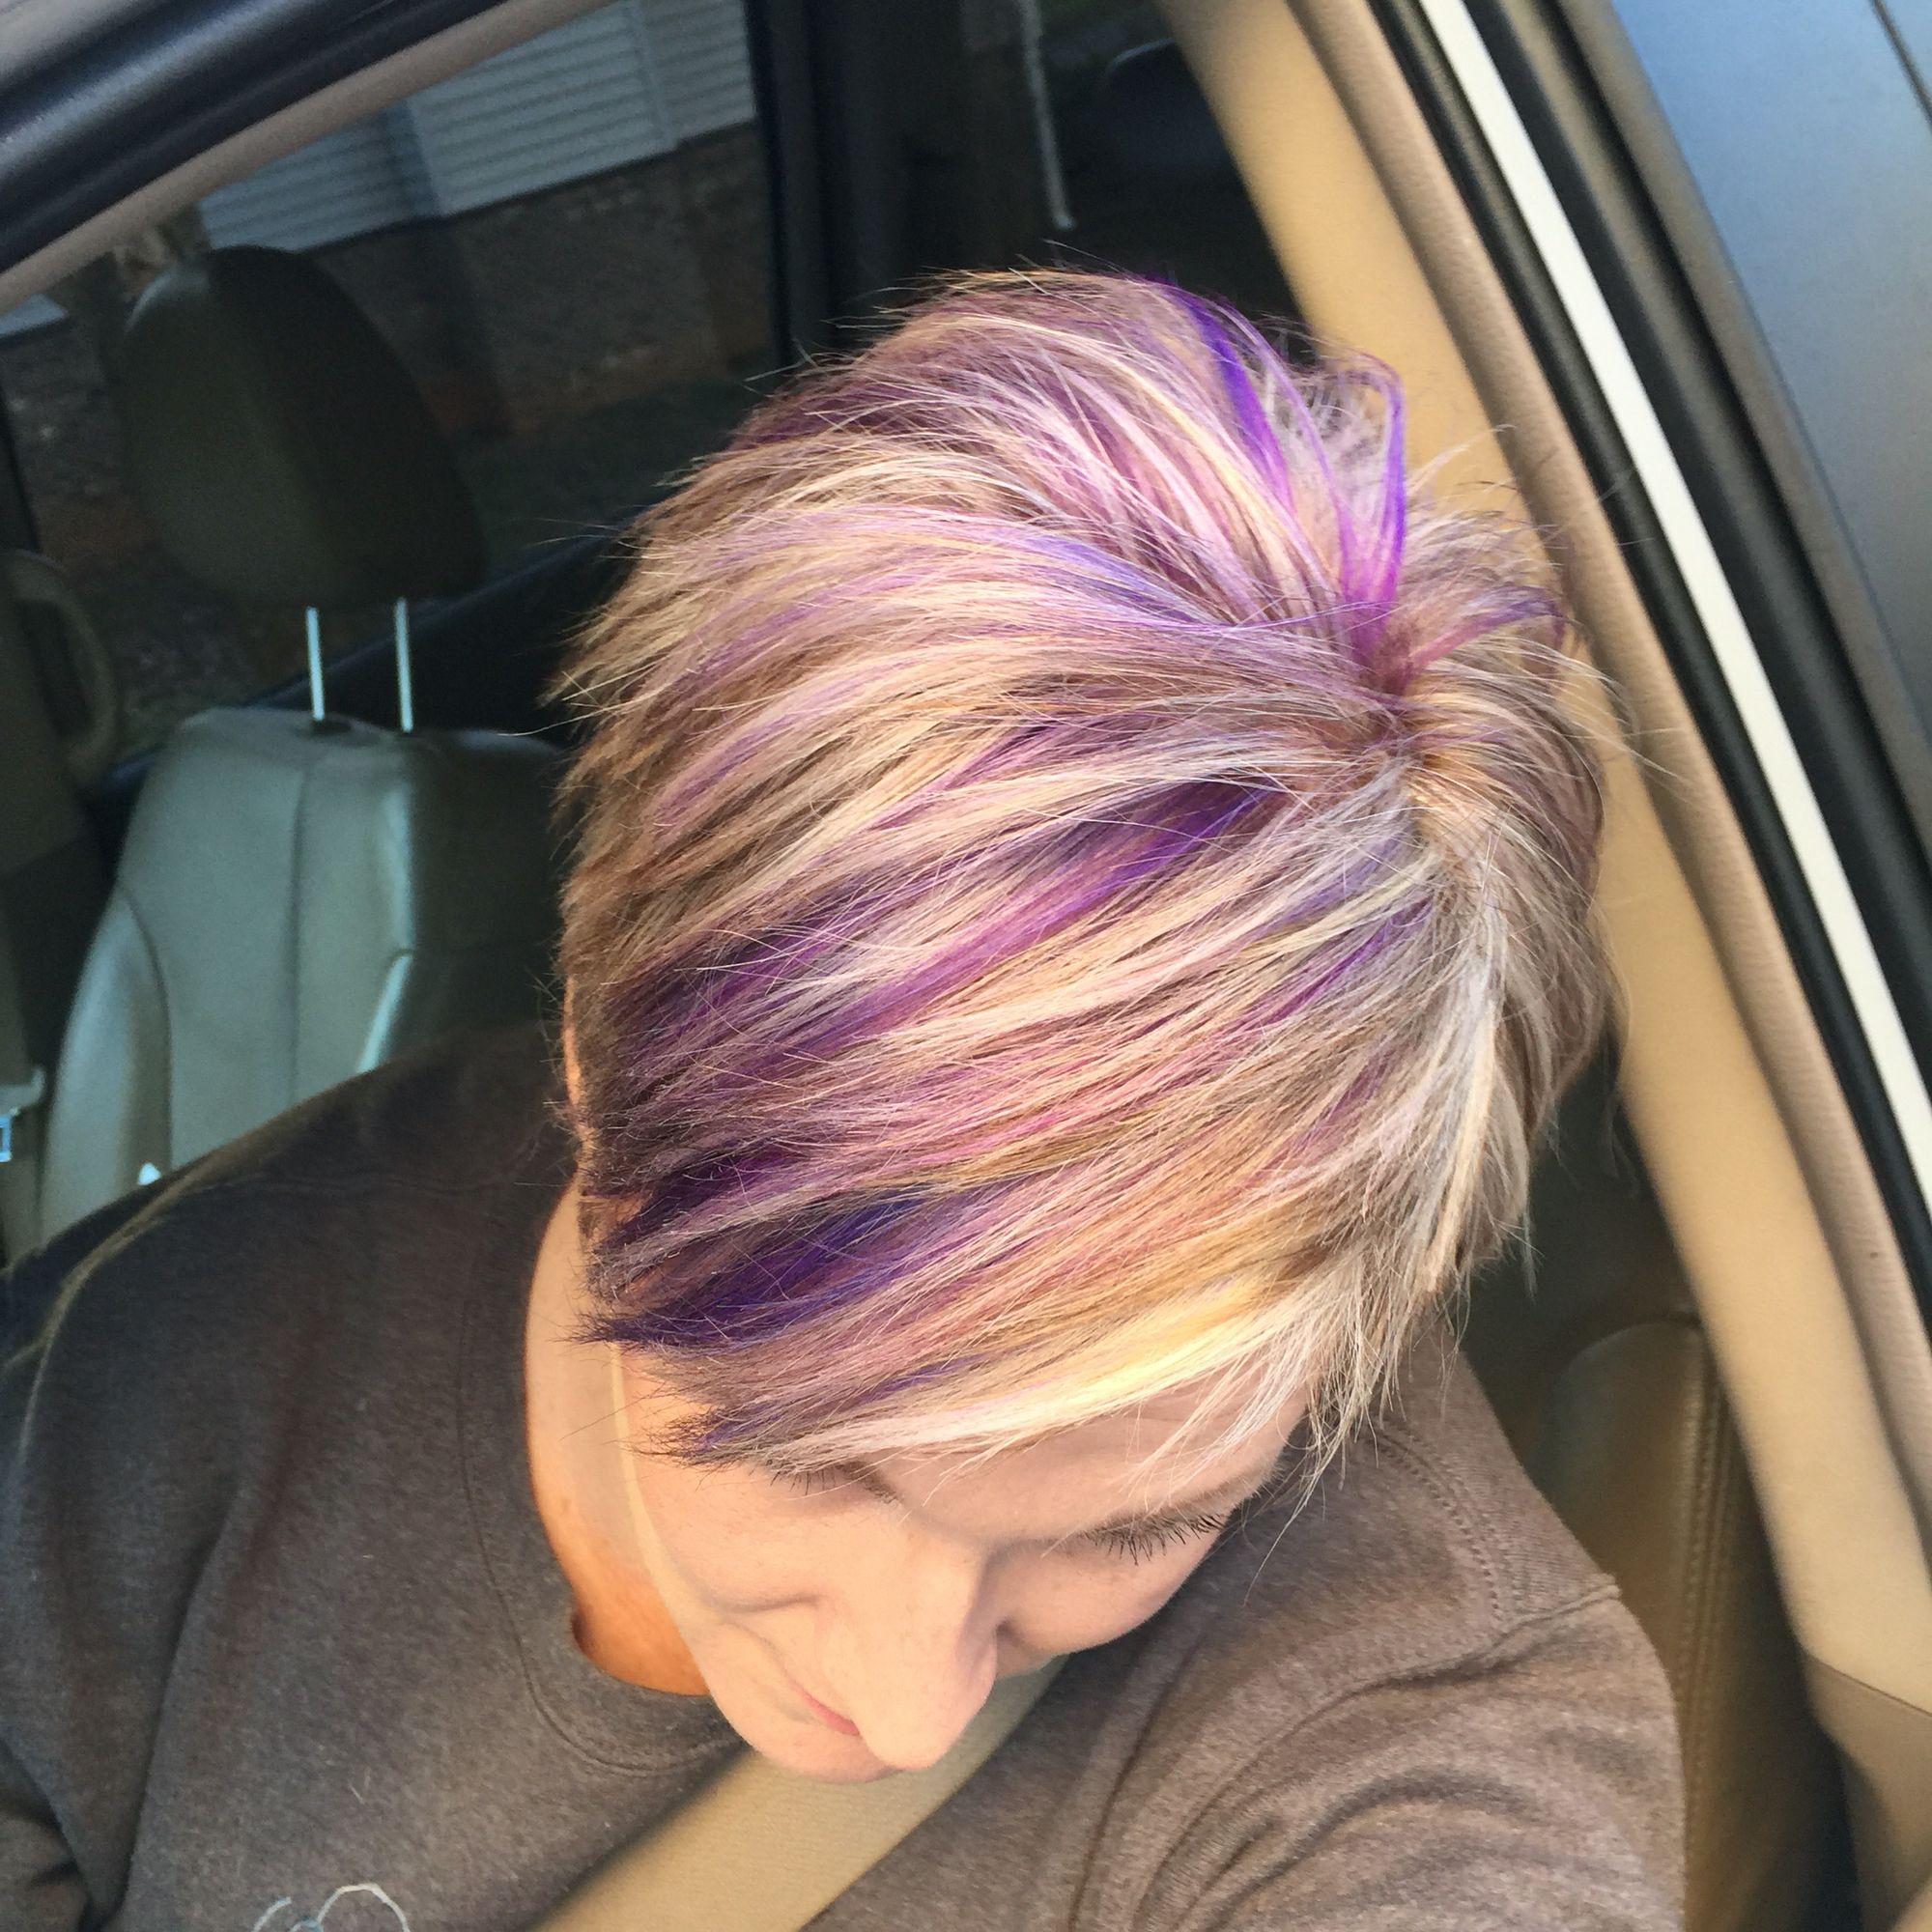 time for a little sass! short hair, pixie cut, purple highlights